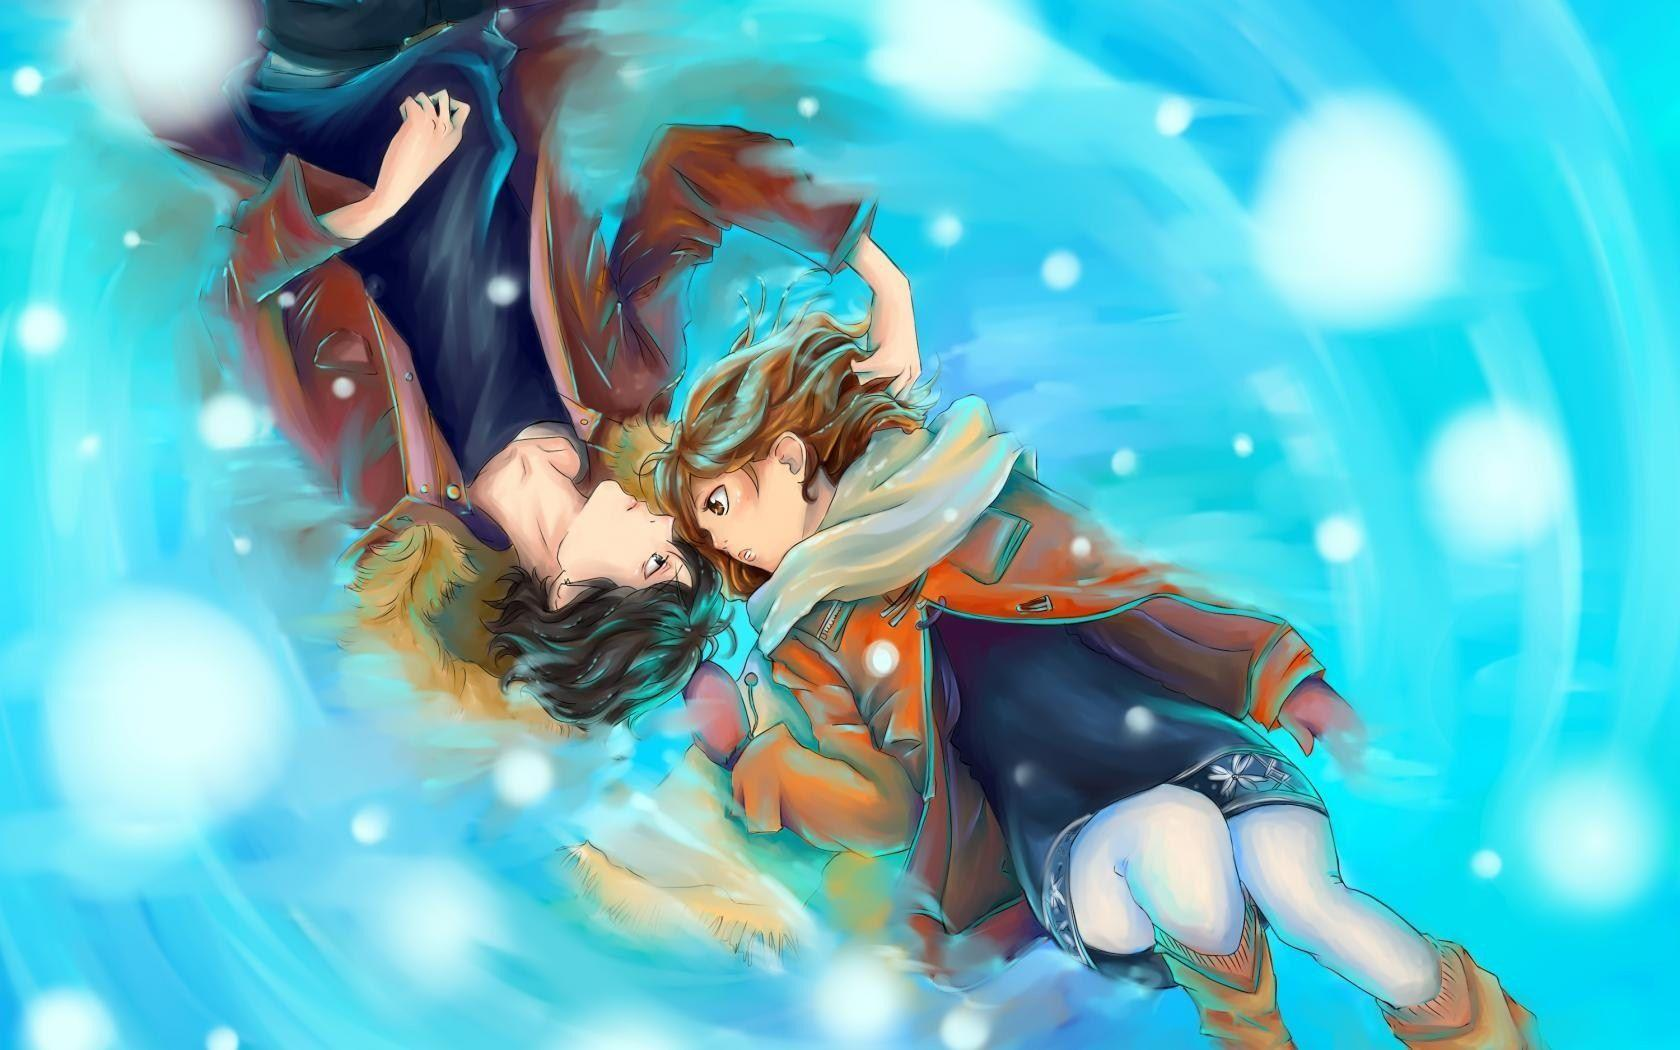 Anime Love Wallpaper Wallpaper Desktop Hd